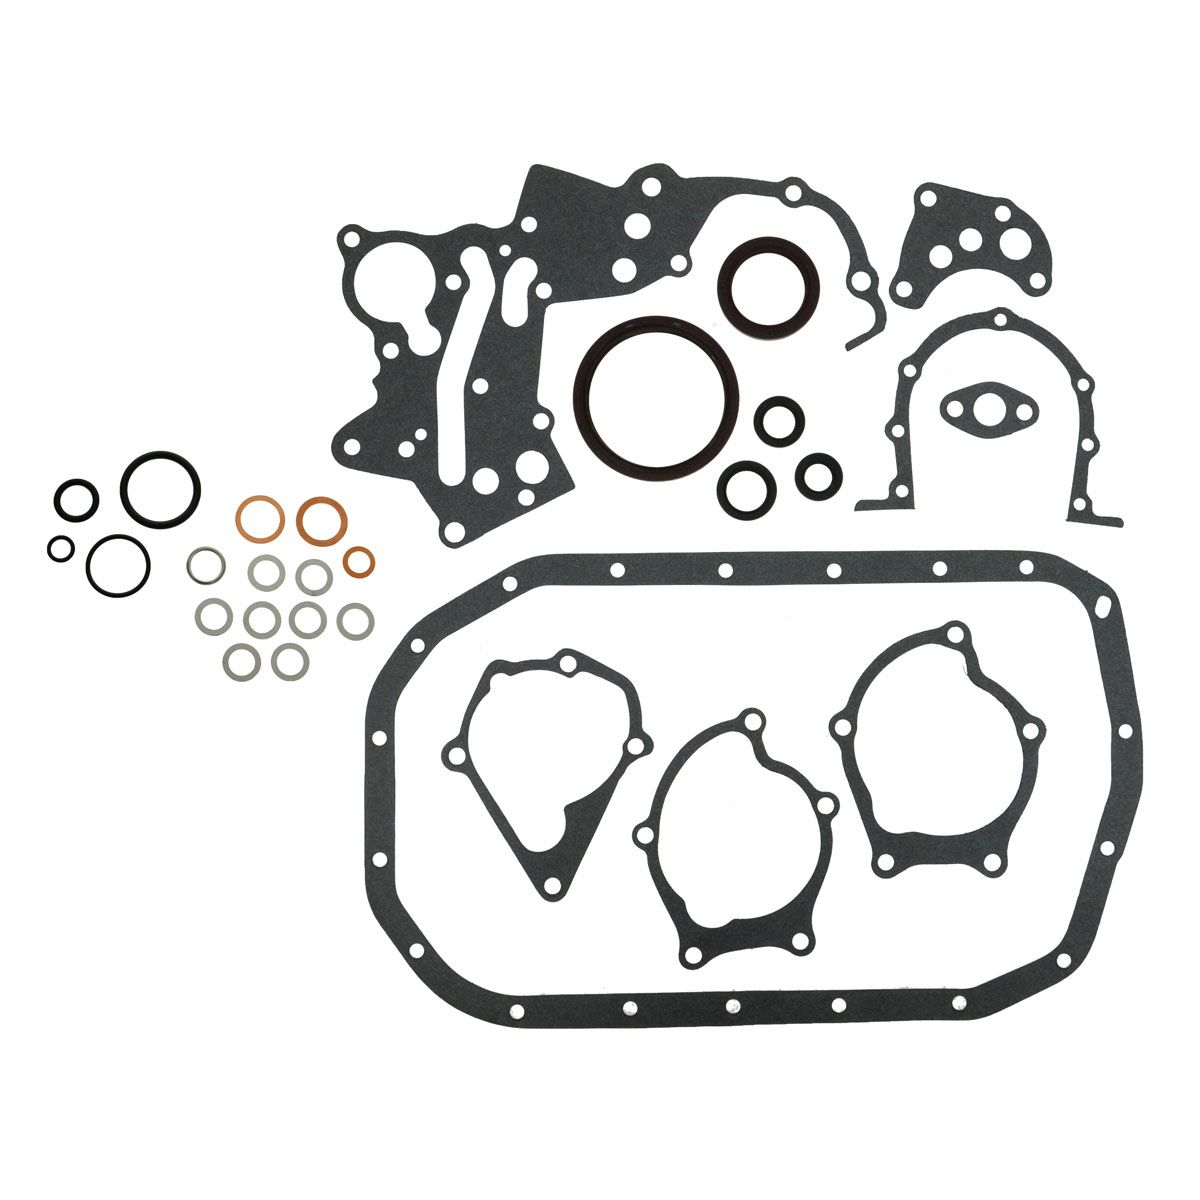 Lower Engine Gasket Set for Colt Summit Talon Eclipse